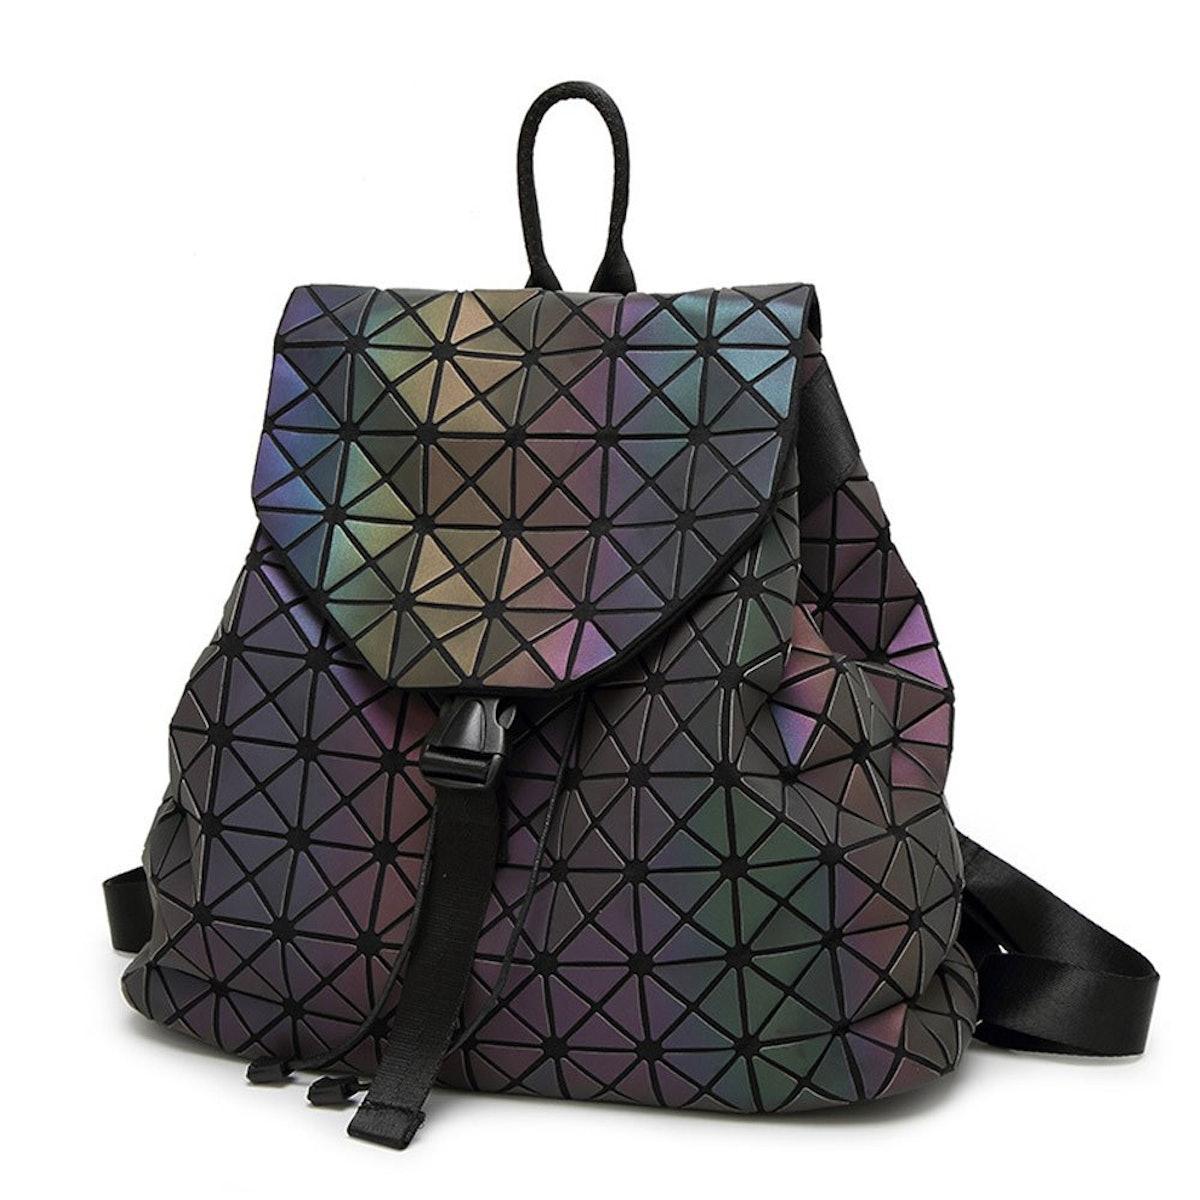 DIOMO Giometric Lingge Backpack